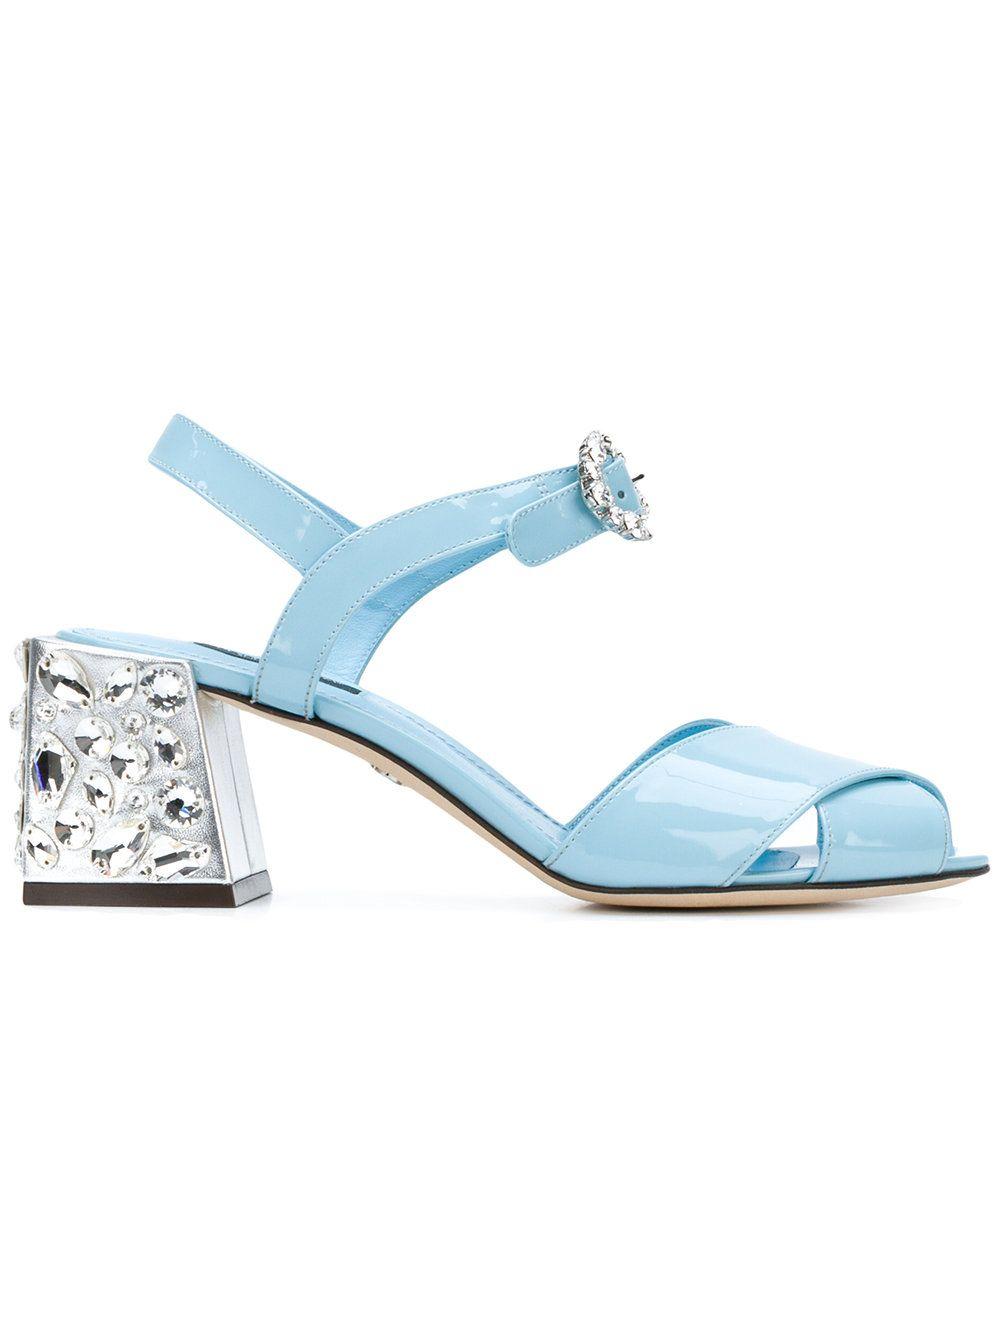 a0553ff4d1c DOLCE   GABBANA BLUE.  dolcegabbana  shoes